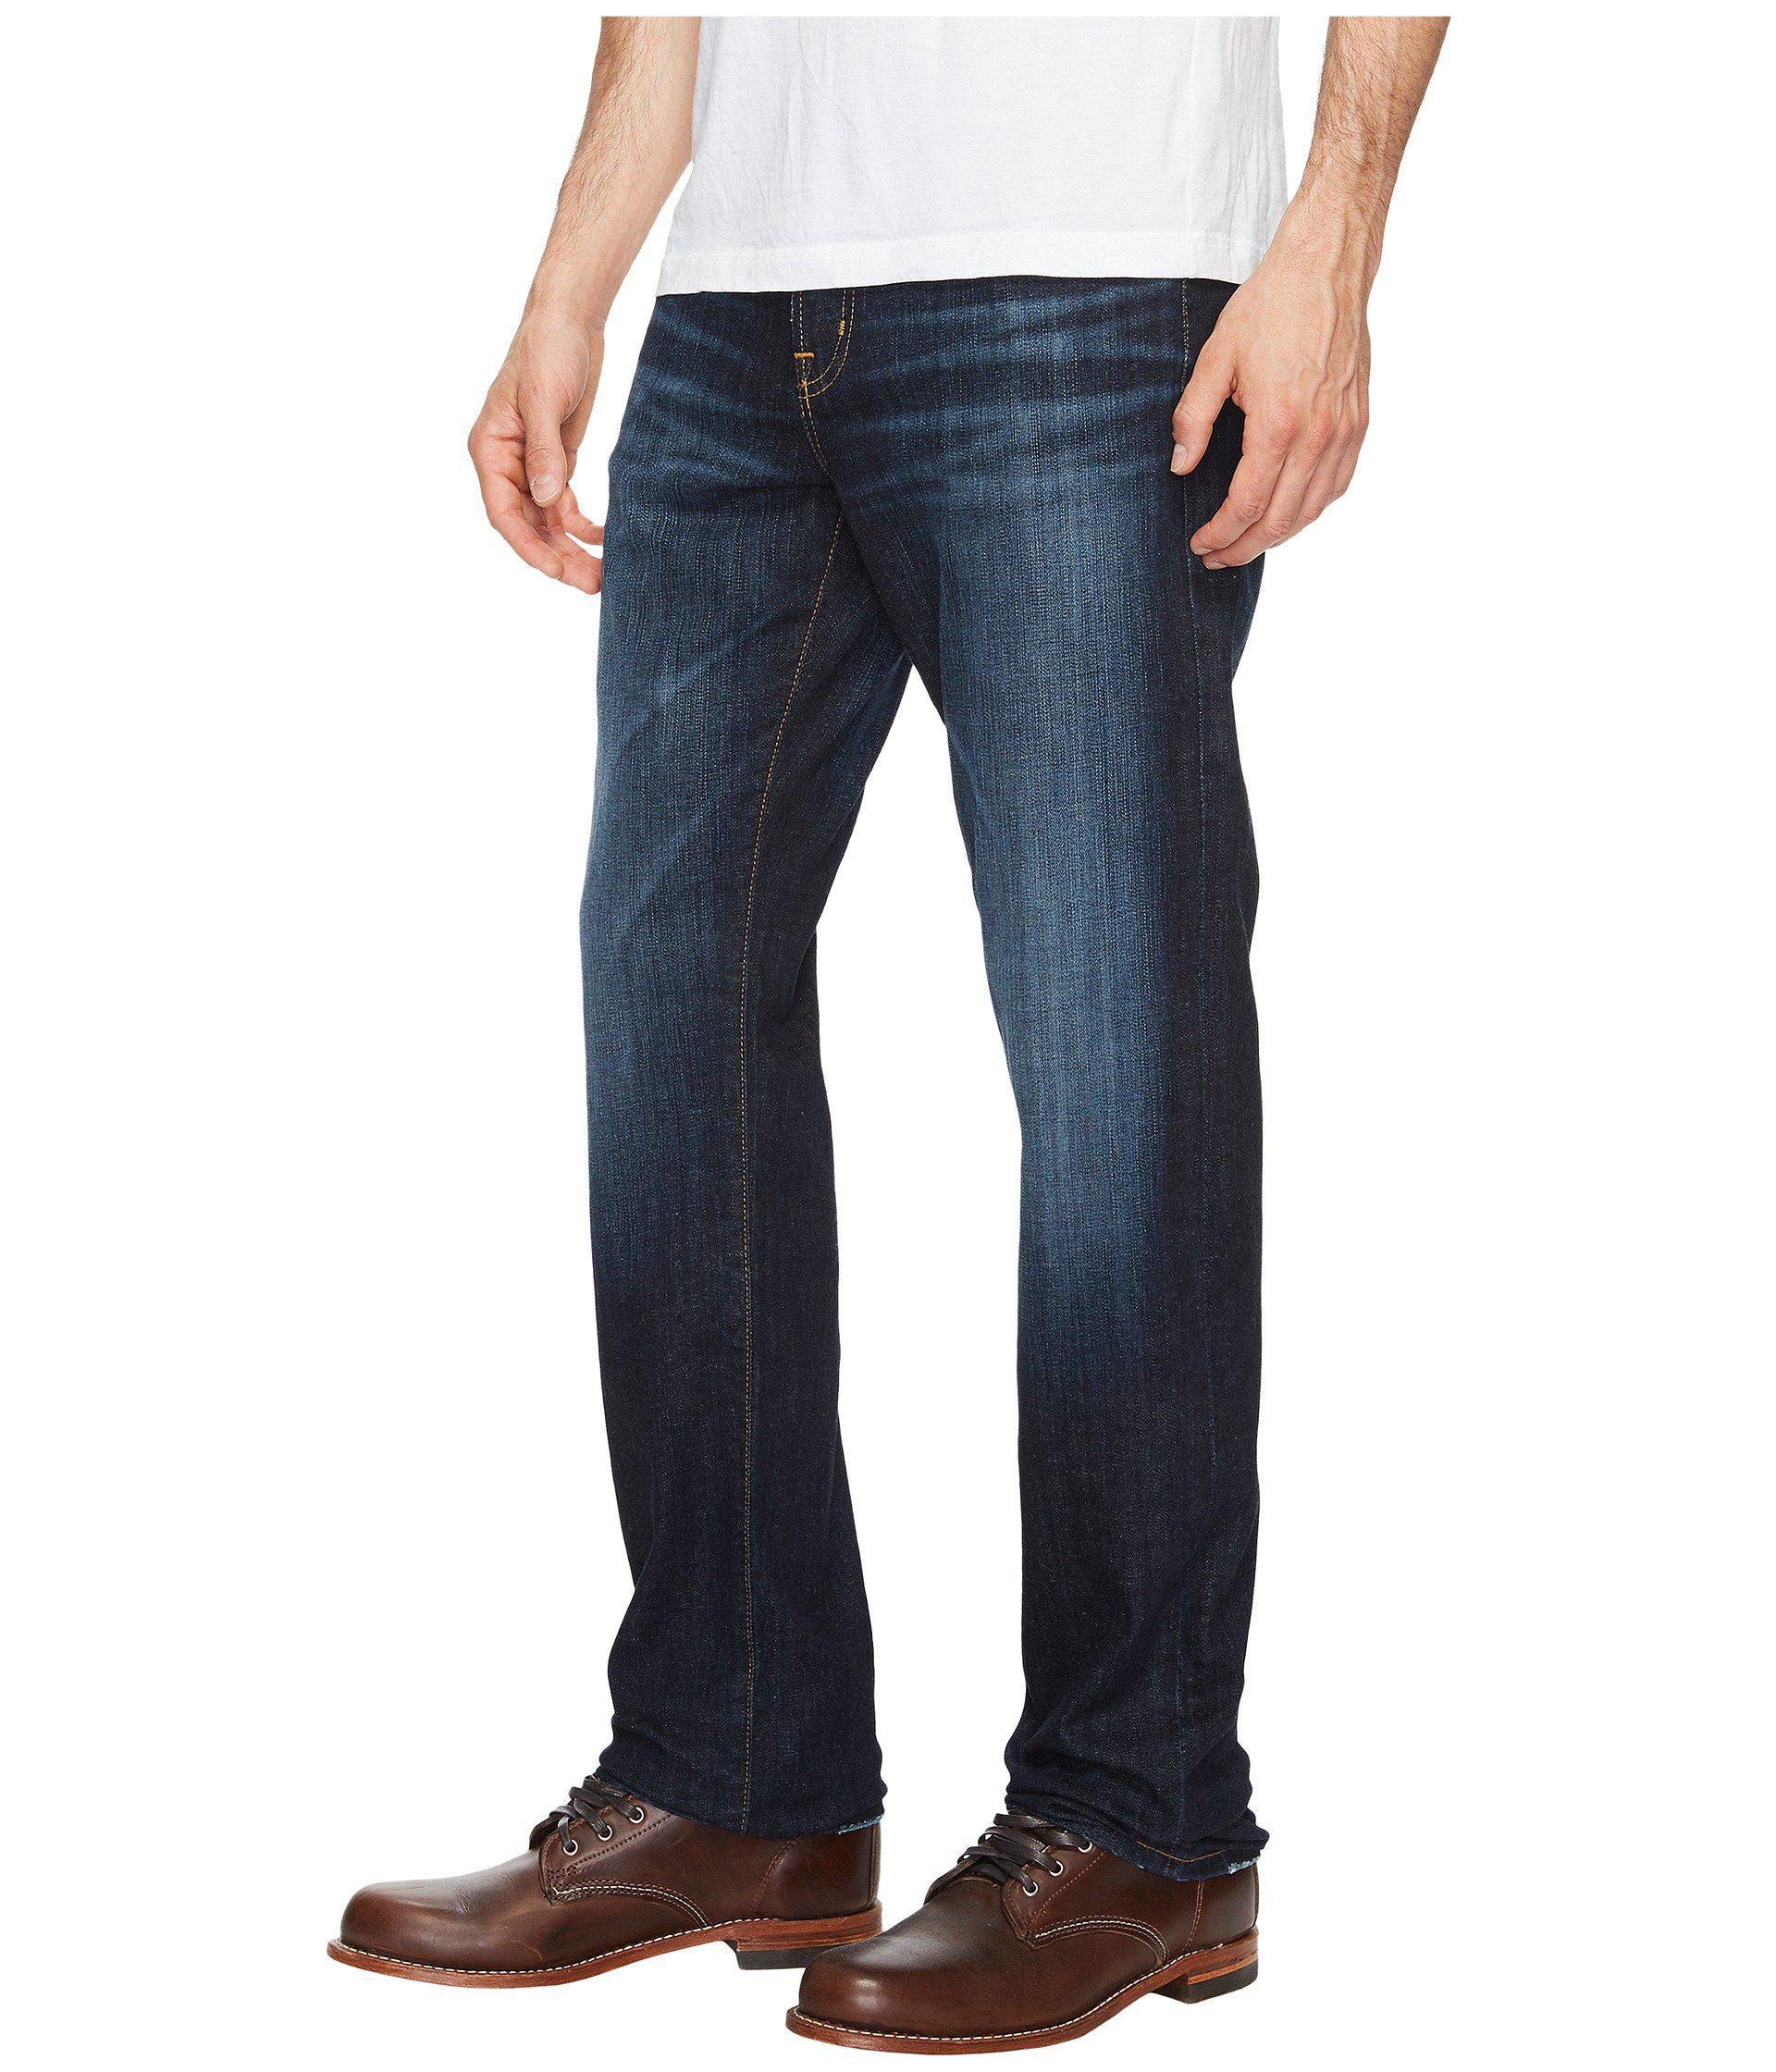 74d5668f75b Lyst - AG Jeans Graduate Tailored Leg Denim In Robinson (robinson) Men s  Jeans in Blue for Men